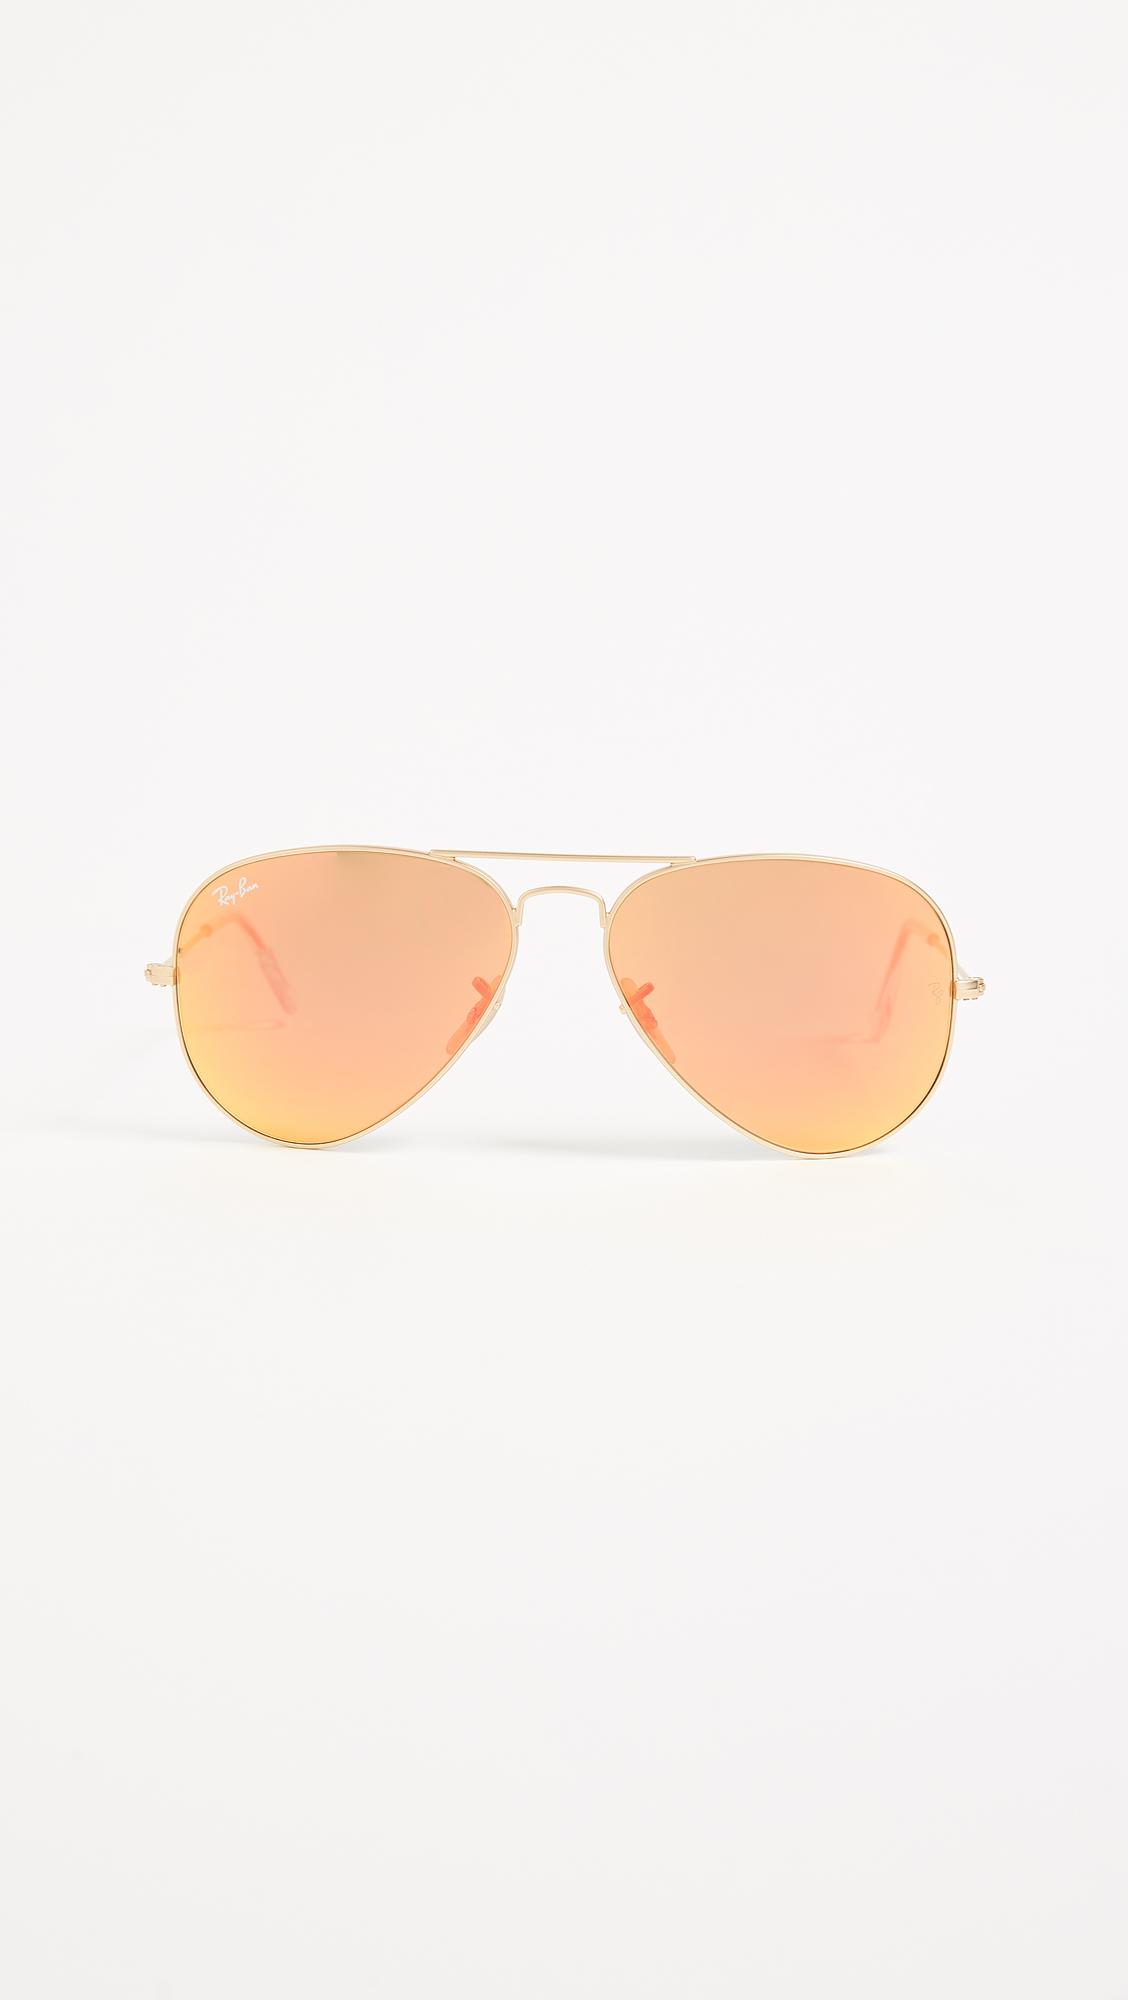 Matte SunglassesShopbop Rb3025 Ray Mirrored Classic Ban Aviator 76bgyf